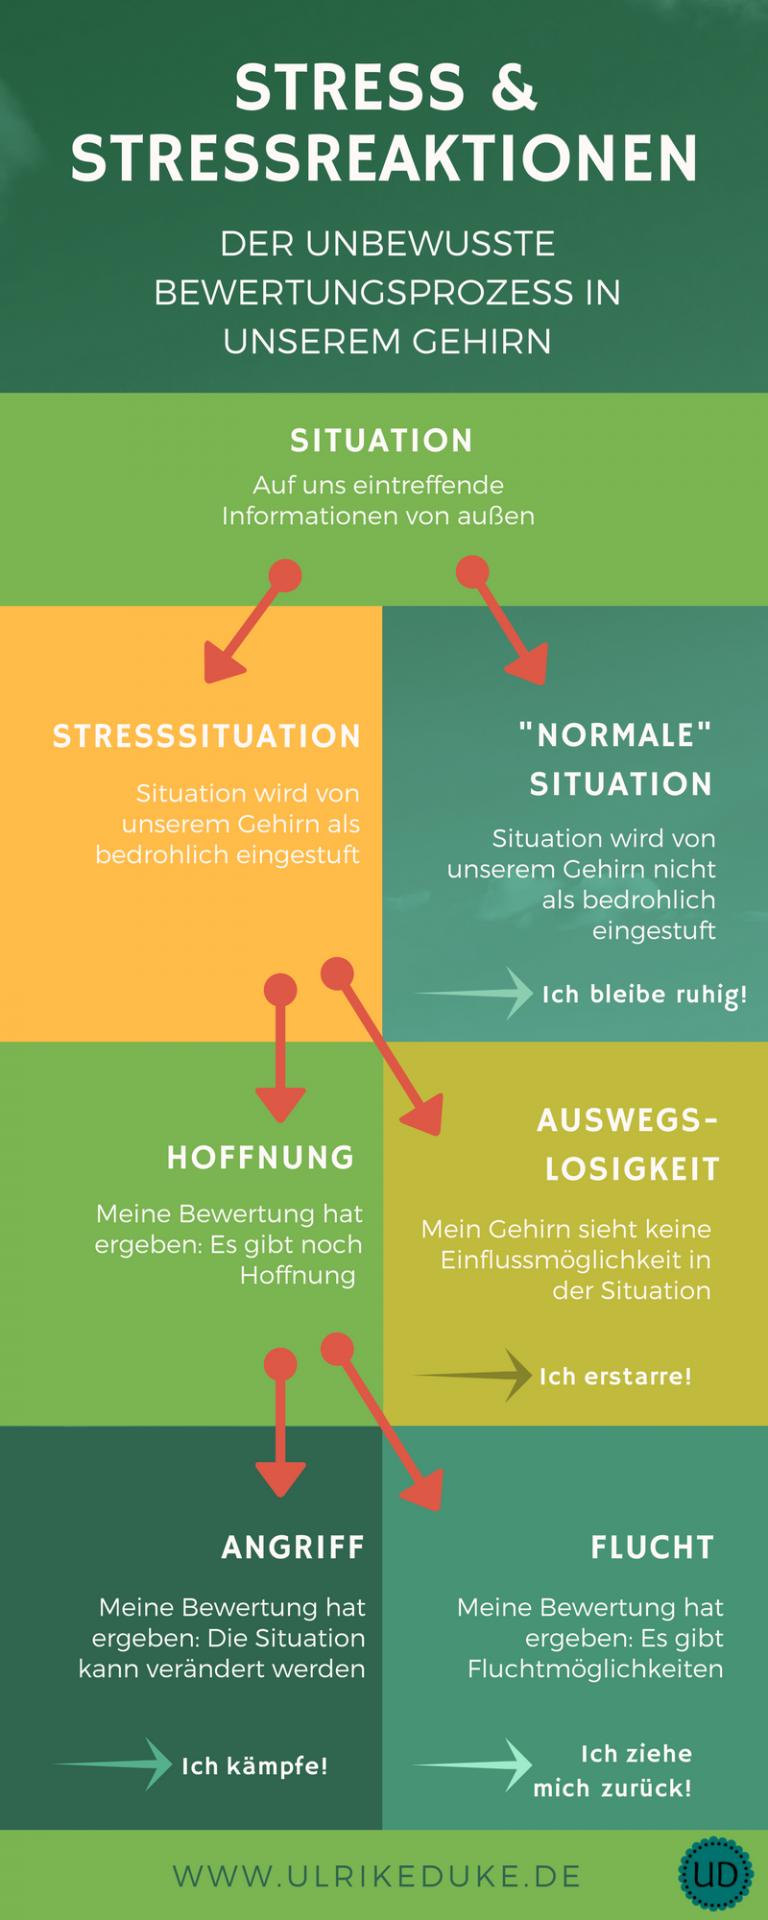 Diplom-Psychologin-Psychologe-74821-Mosbach-Stressmanagement-Lazarus-Stressmodell-Stressbewältigung-Stressabbau-Stress-Stress-less-Achtsamkeit-Achtsamkeitsübung-Achtsamkeitsmeditation-B-4